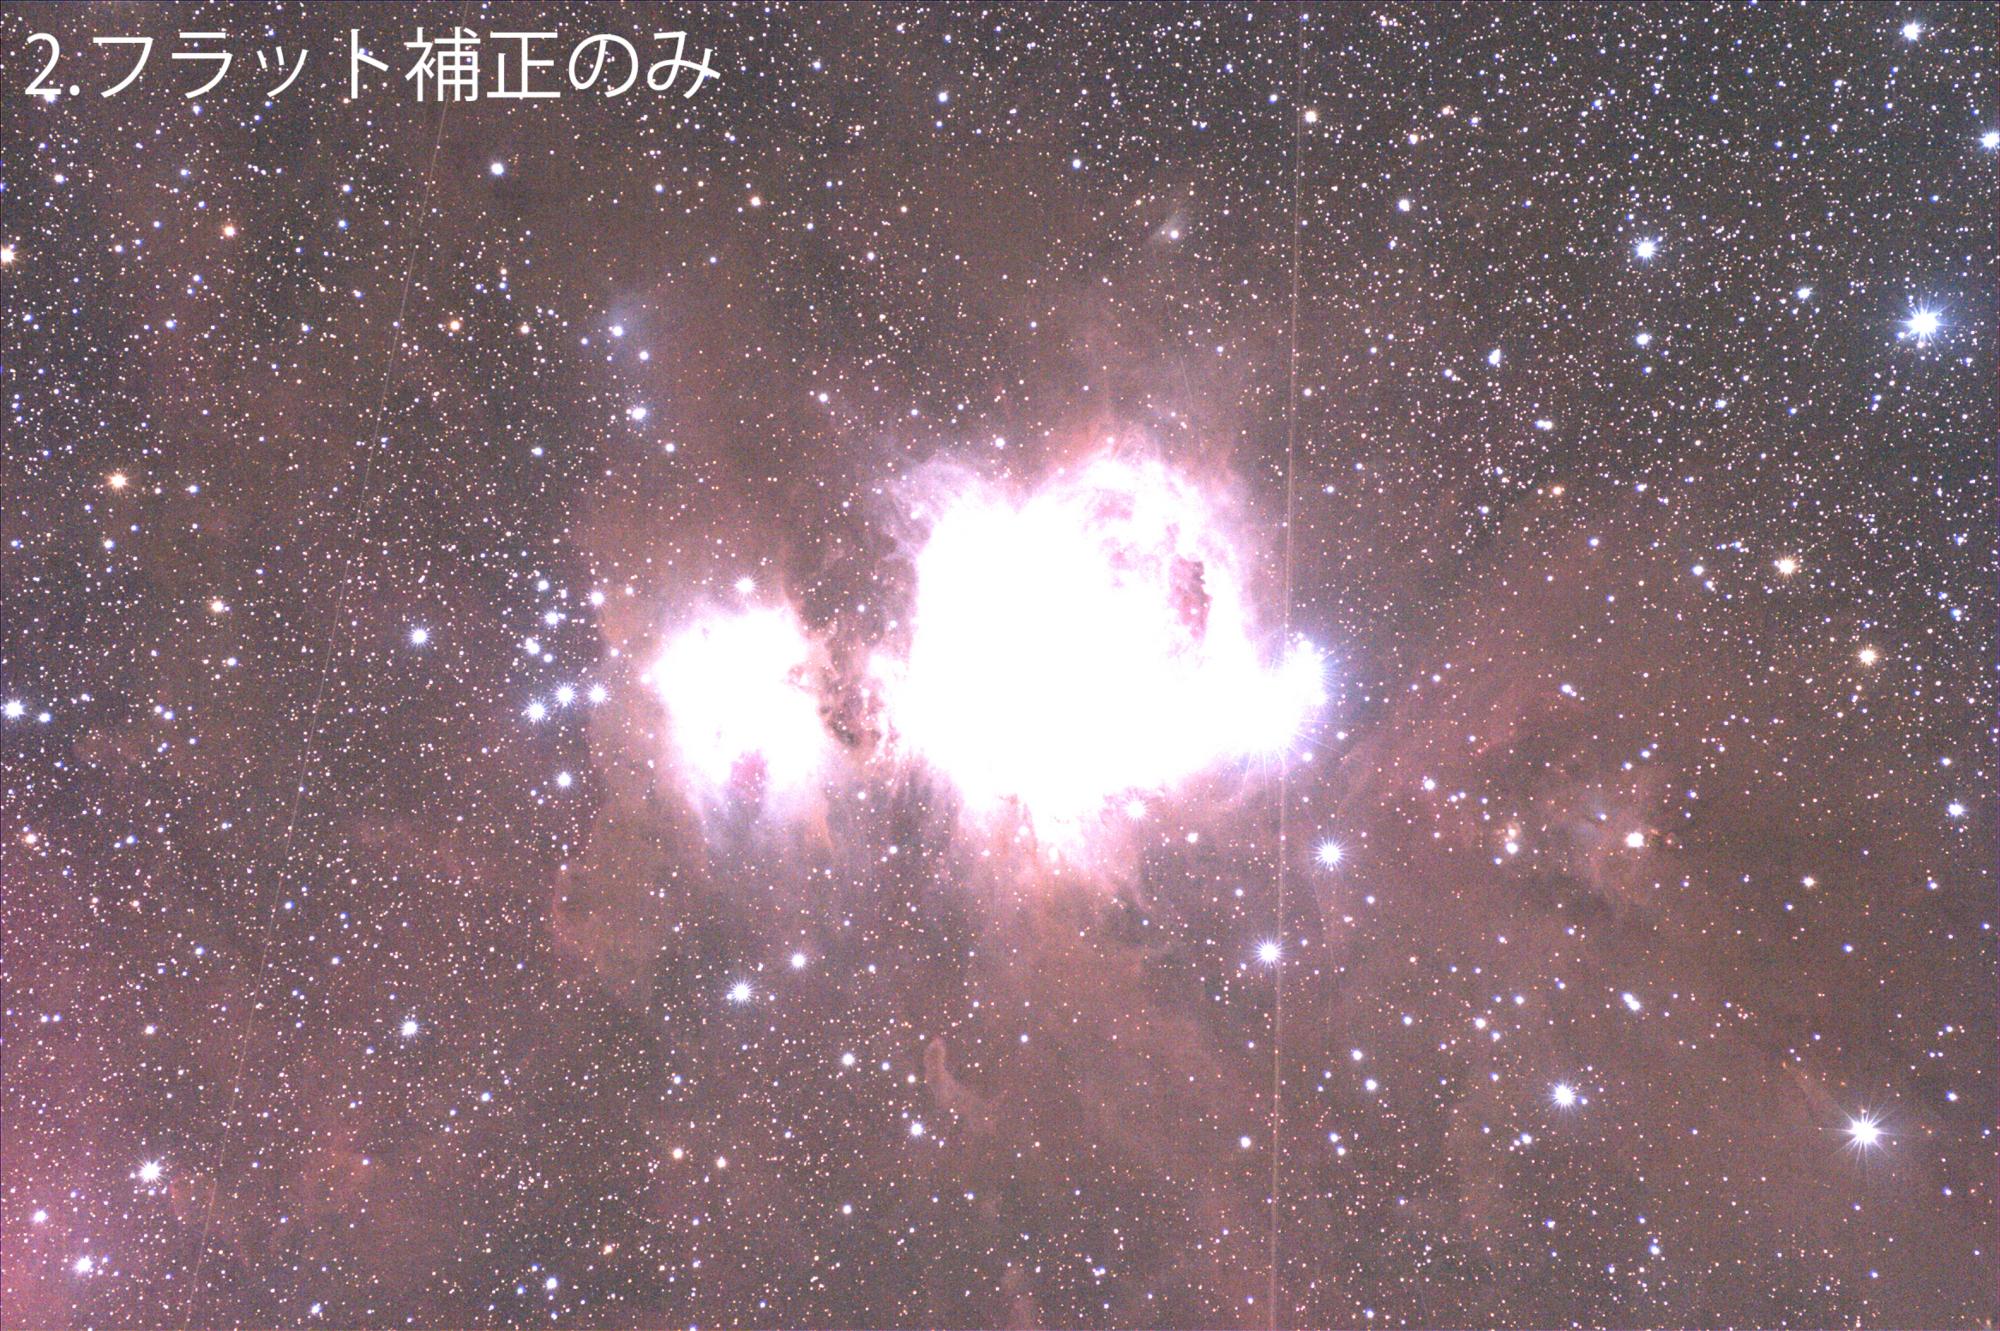 f:id:snct-astro:20171210225004j:plain